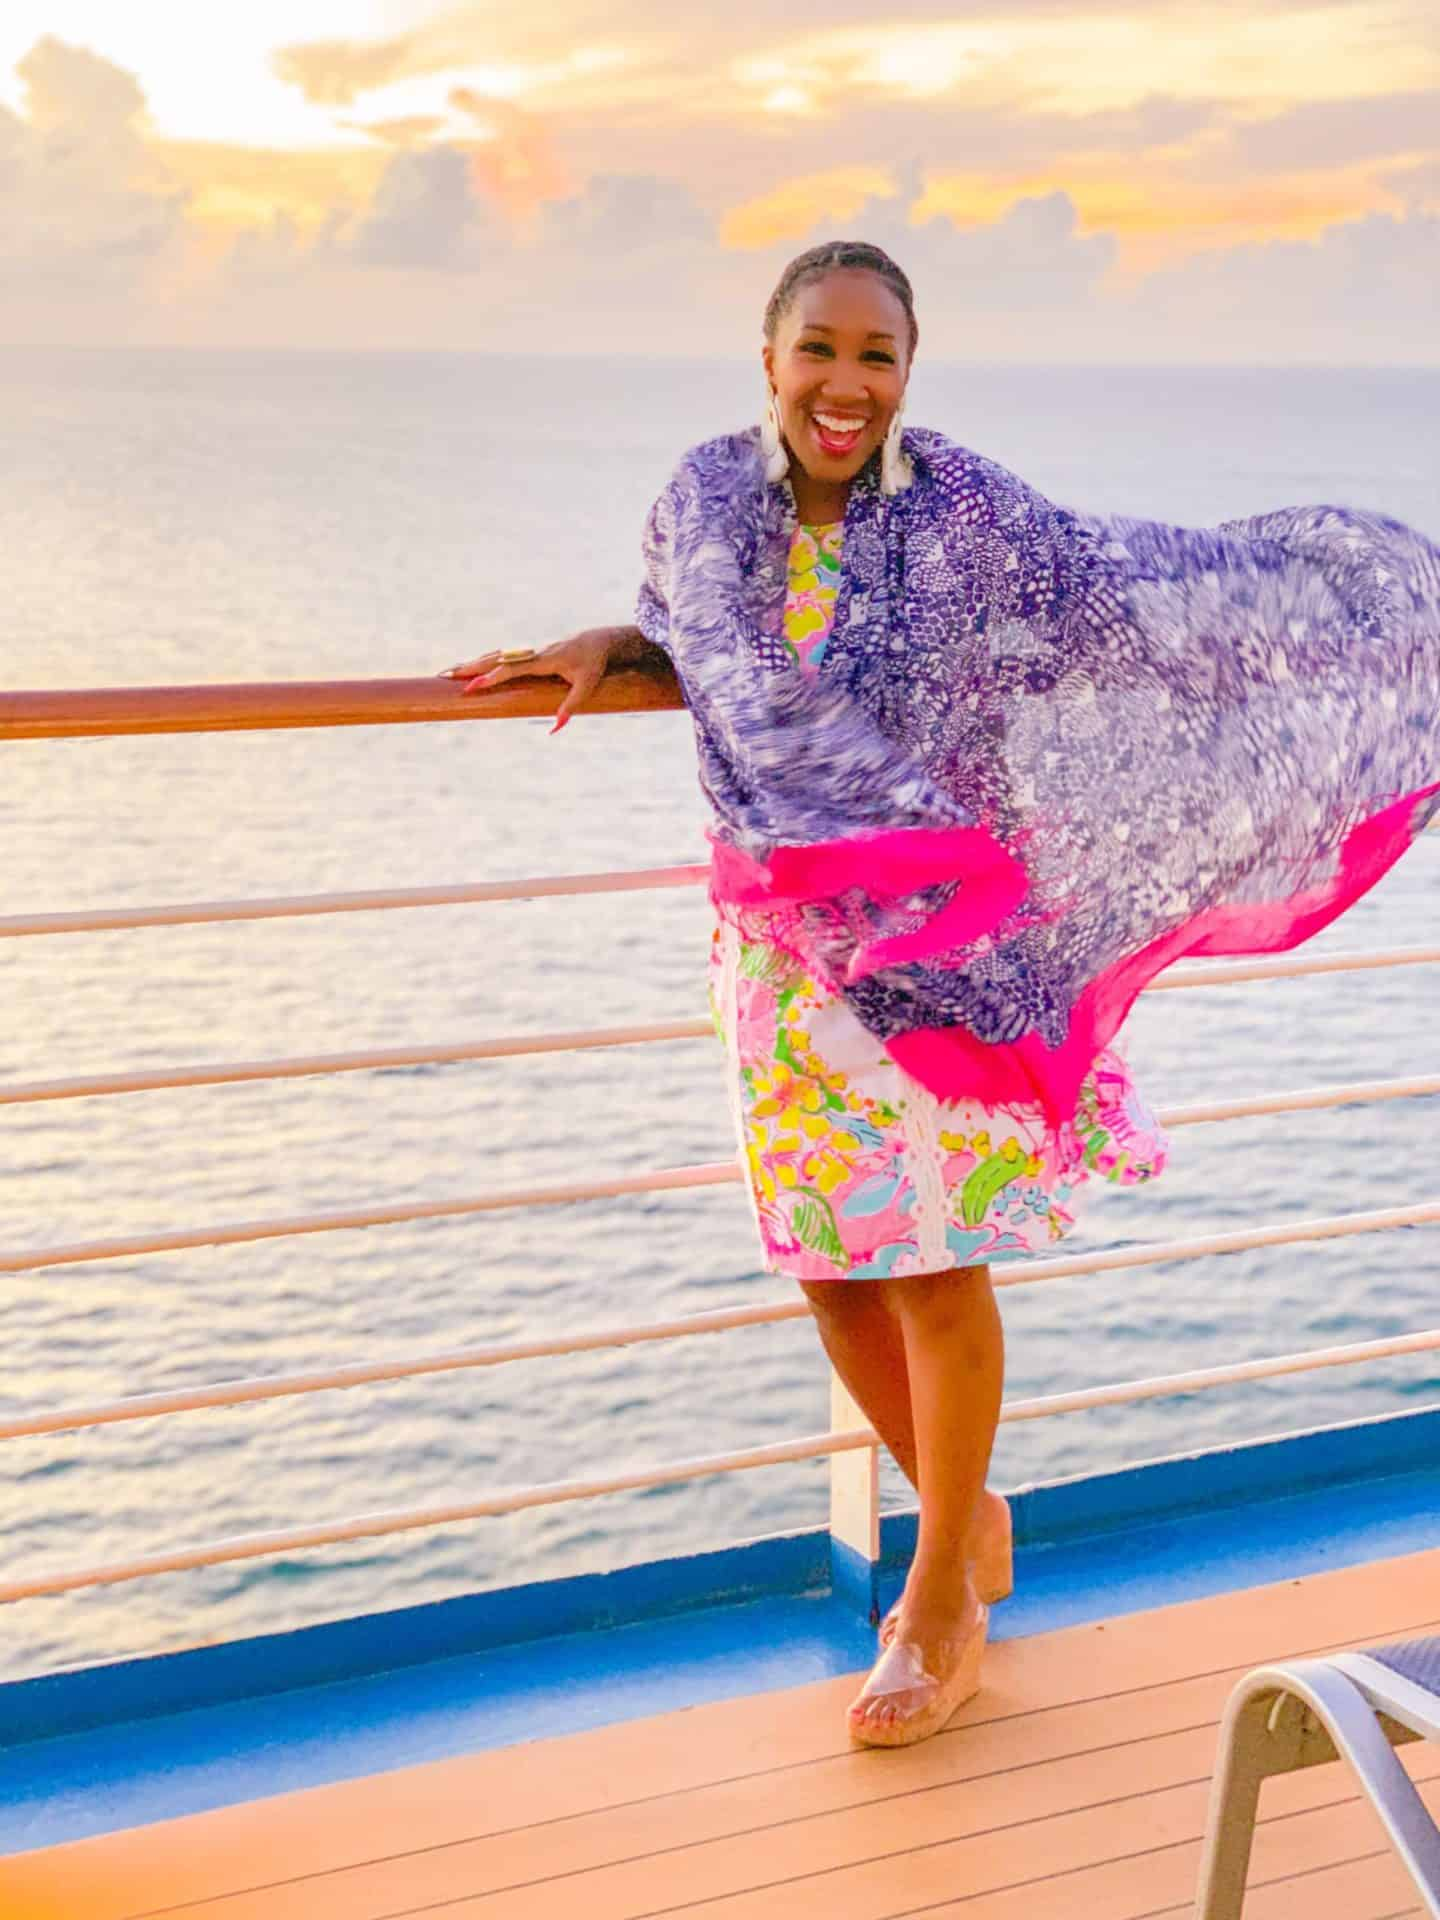 Carnival Vista sunset balcony pictures | Shaunda Necole